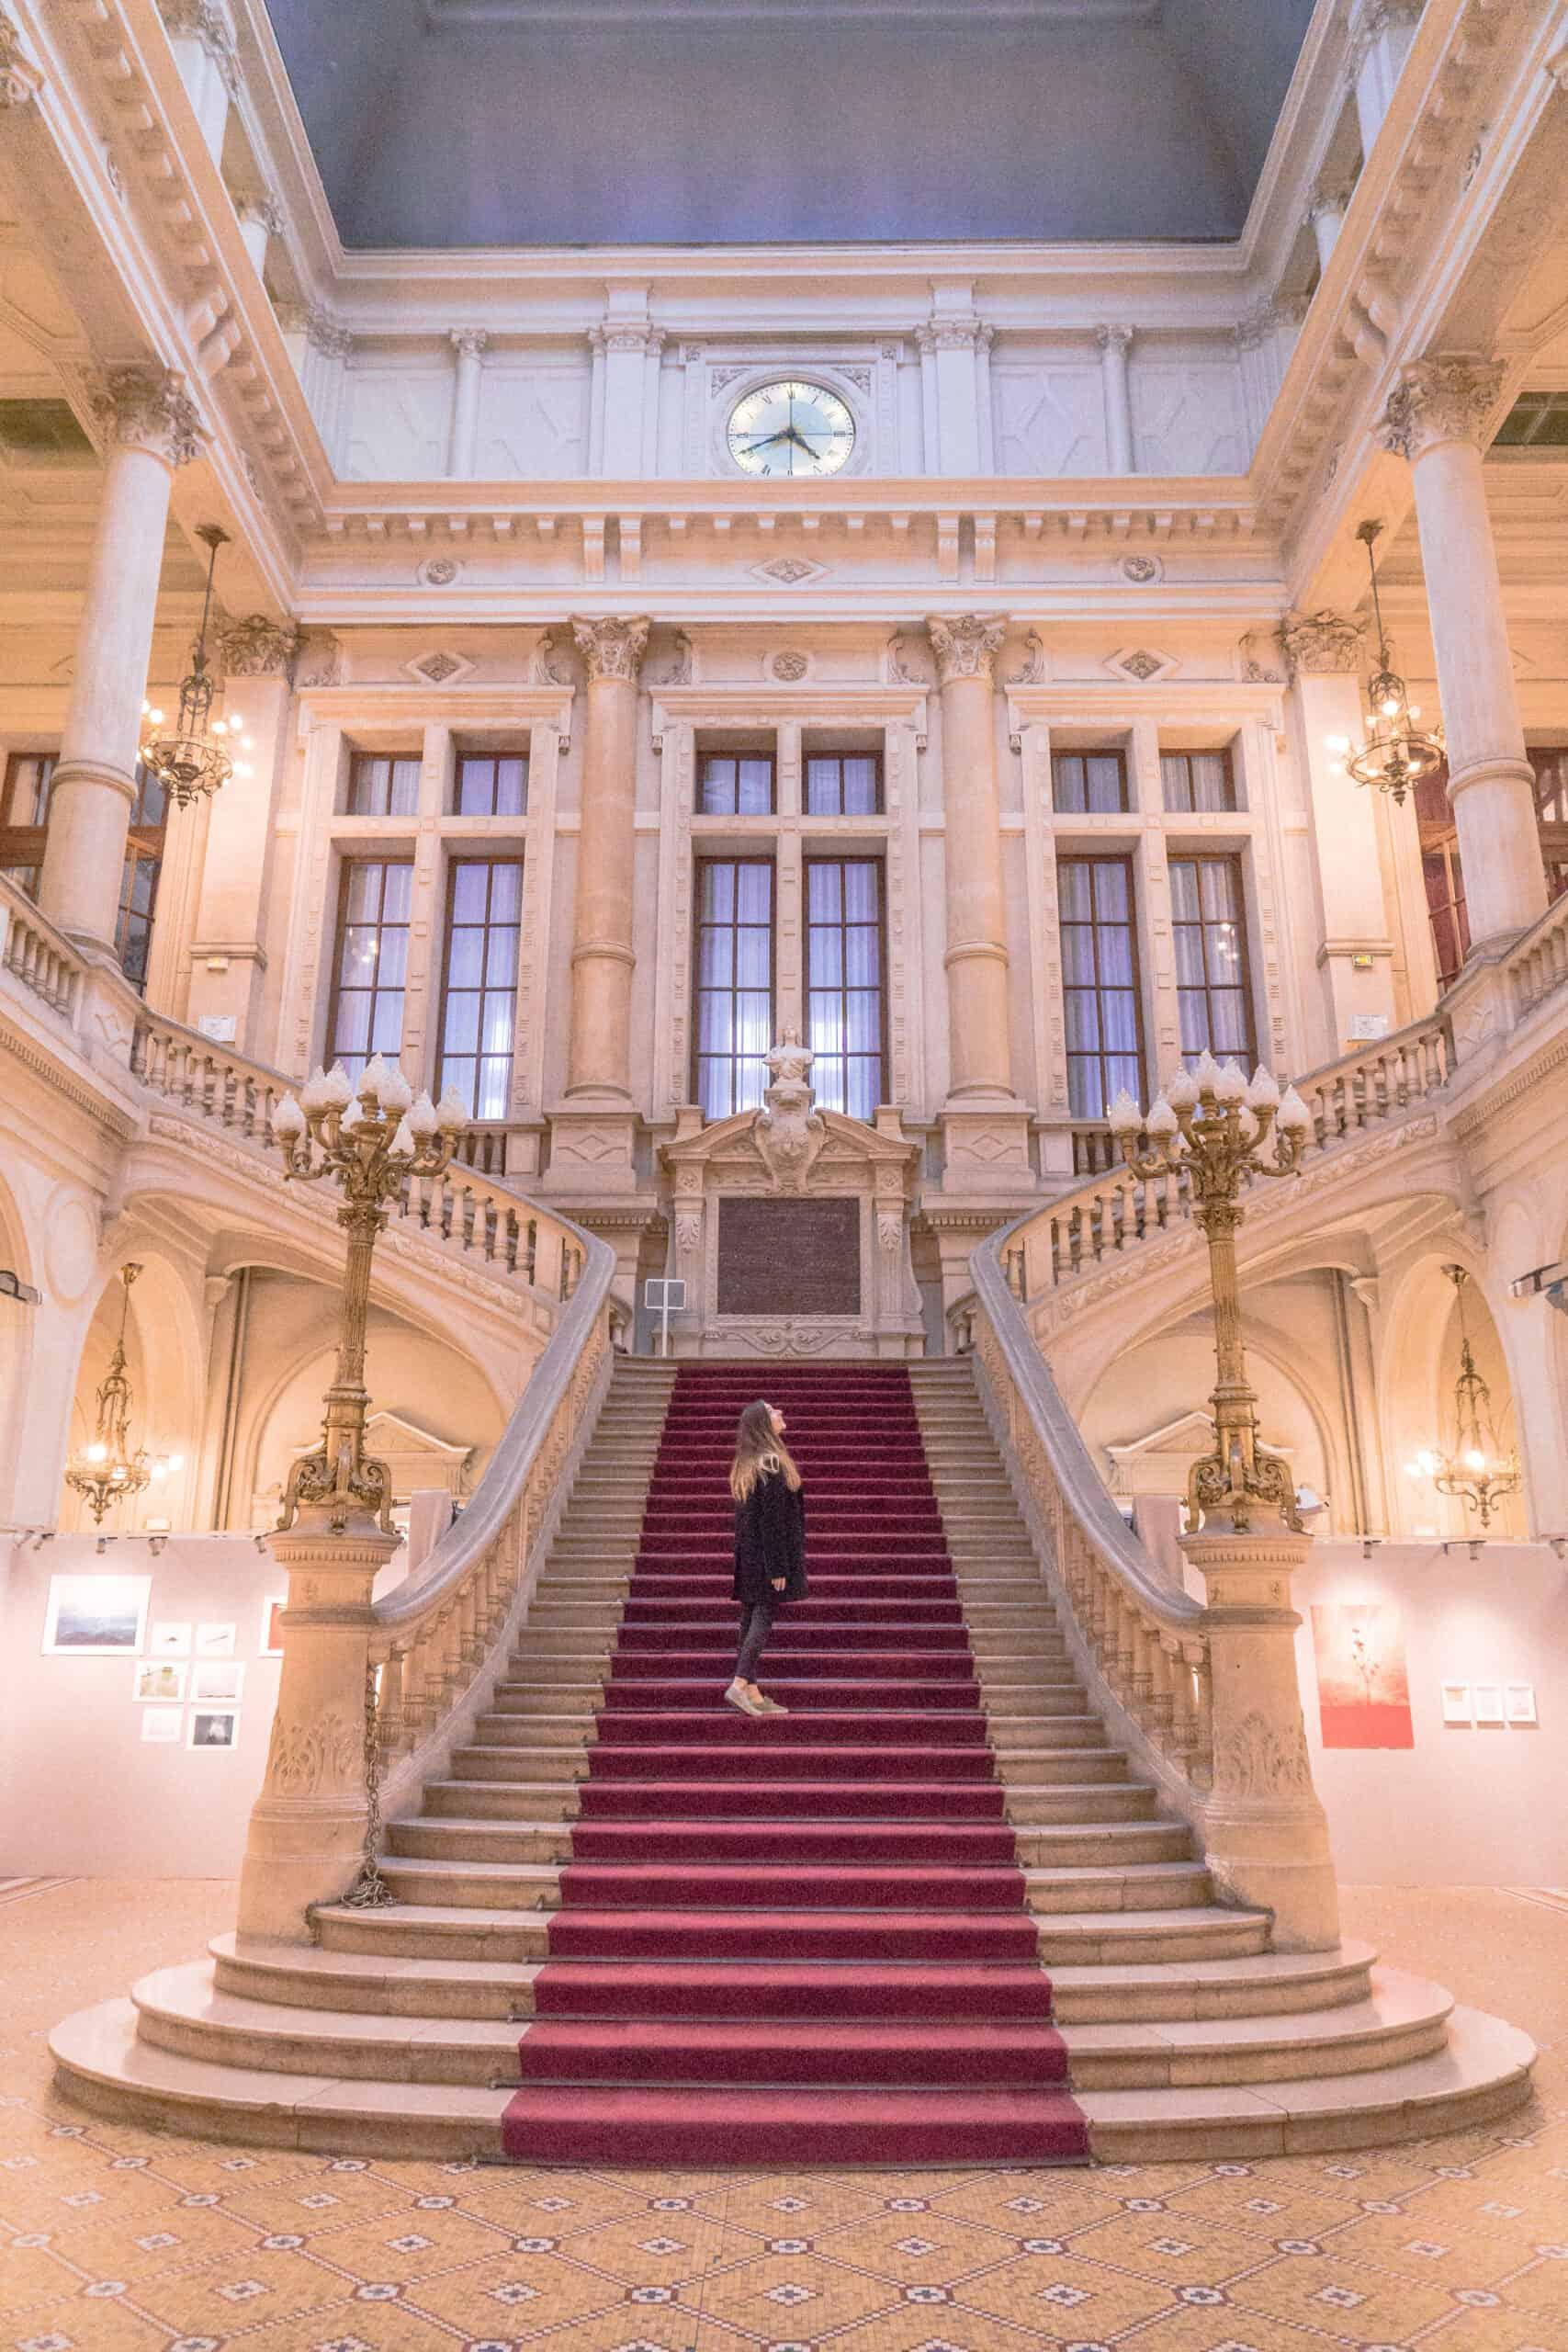 History & Architecture of the Mairie du 10e Arrondissement of Paris: town hall of the 10th district, Paris, France